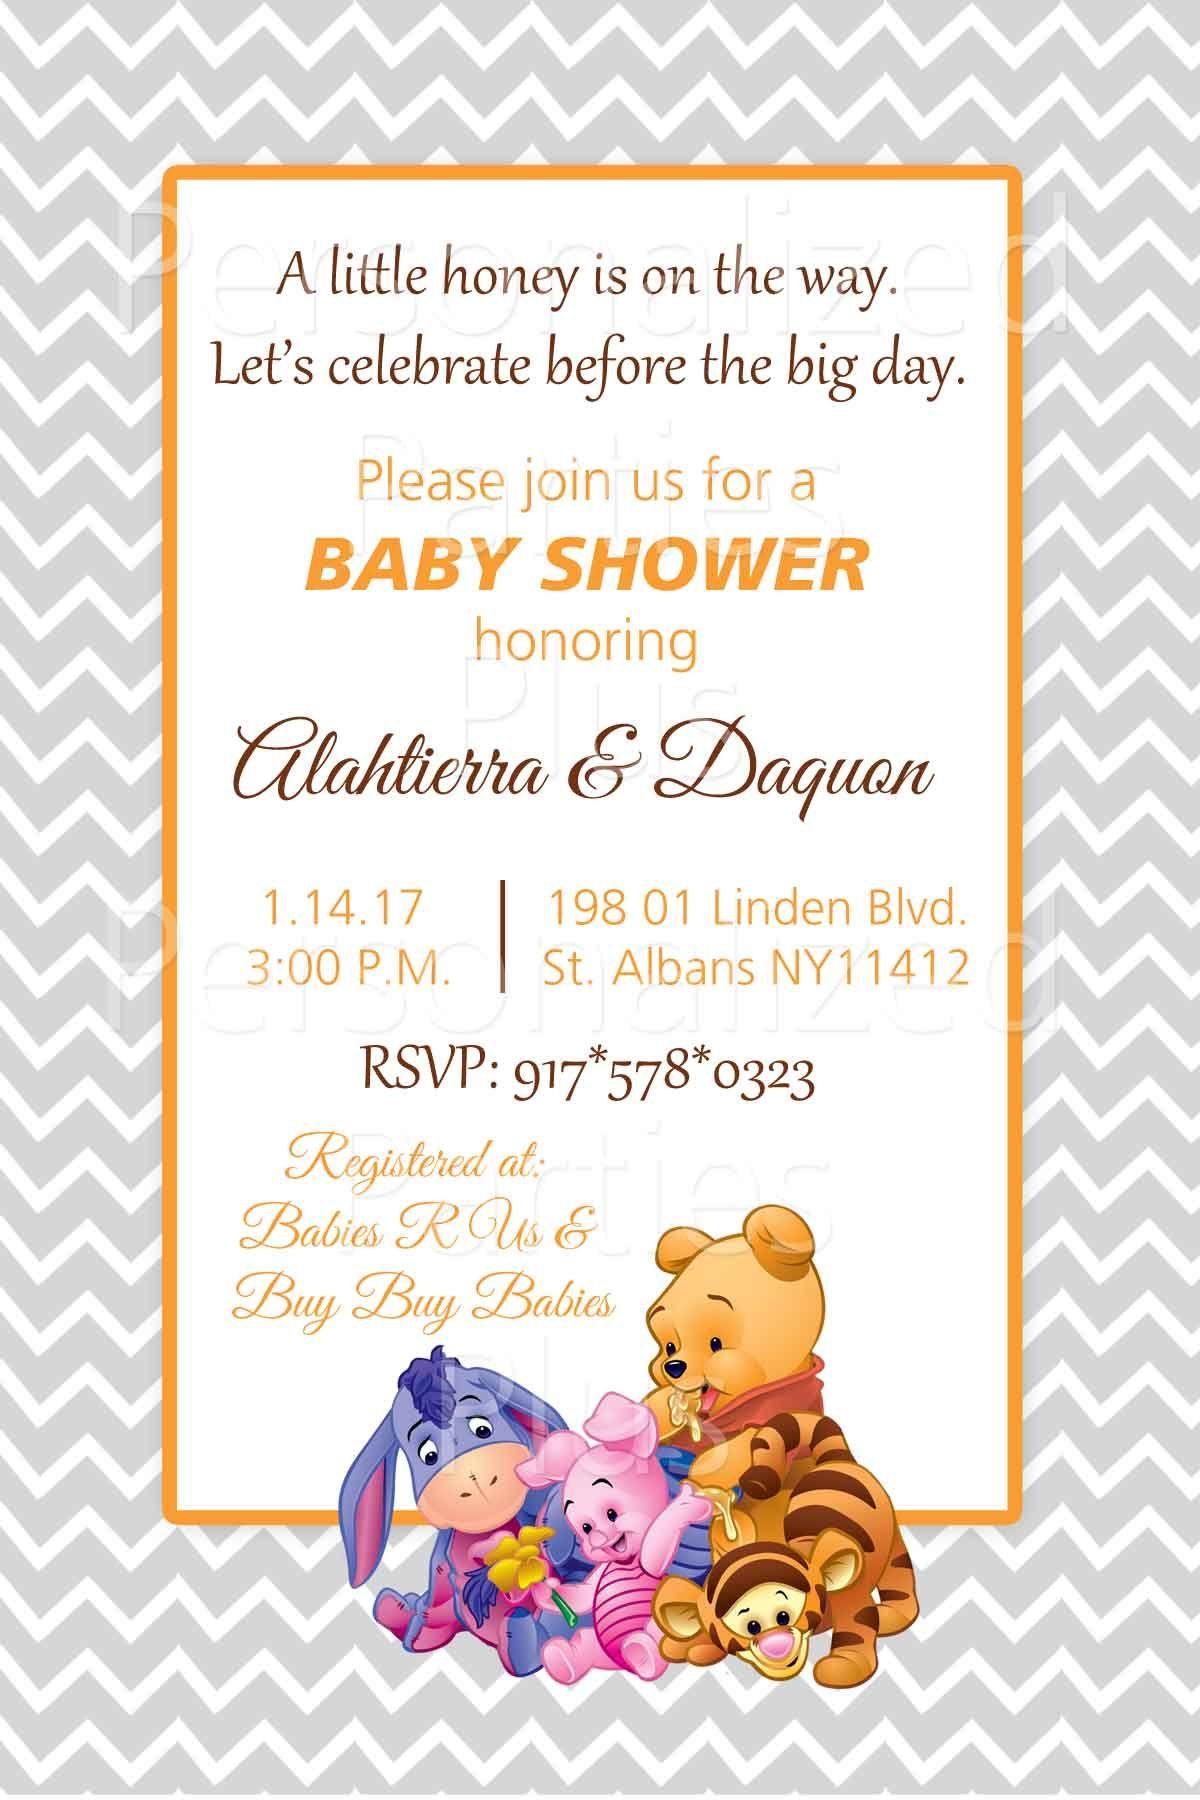 Enthralling Winnie Pooh Baby Shower Invitation Boys Or Winnie Pooh Baby Shower Invitation Shower Babies Winnie Pooh Baby Shower Invitations Wording Winnie Pooh Baby Shower Invitations Download